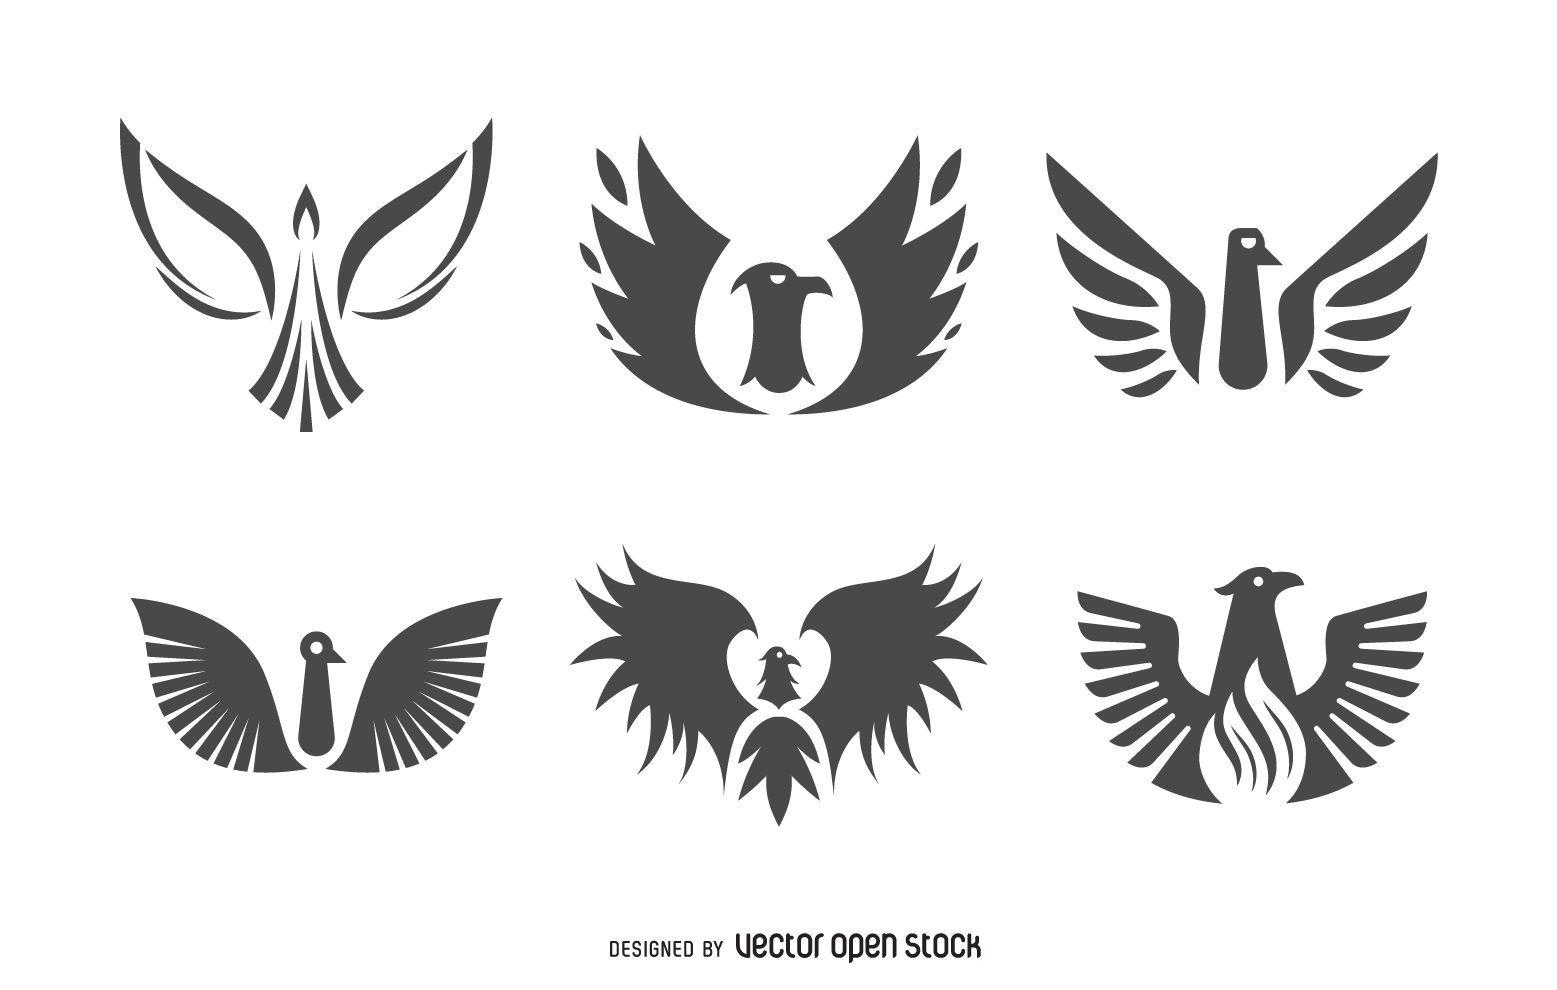 Conjunto de logotipo de ave fênix plana